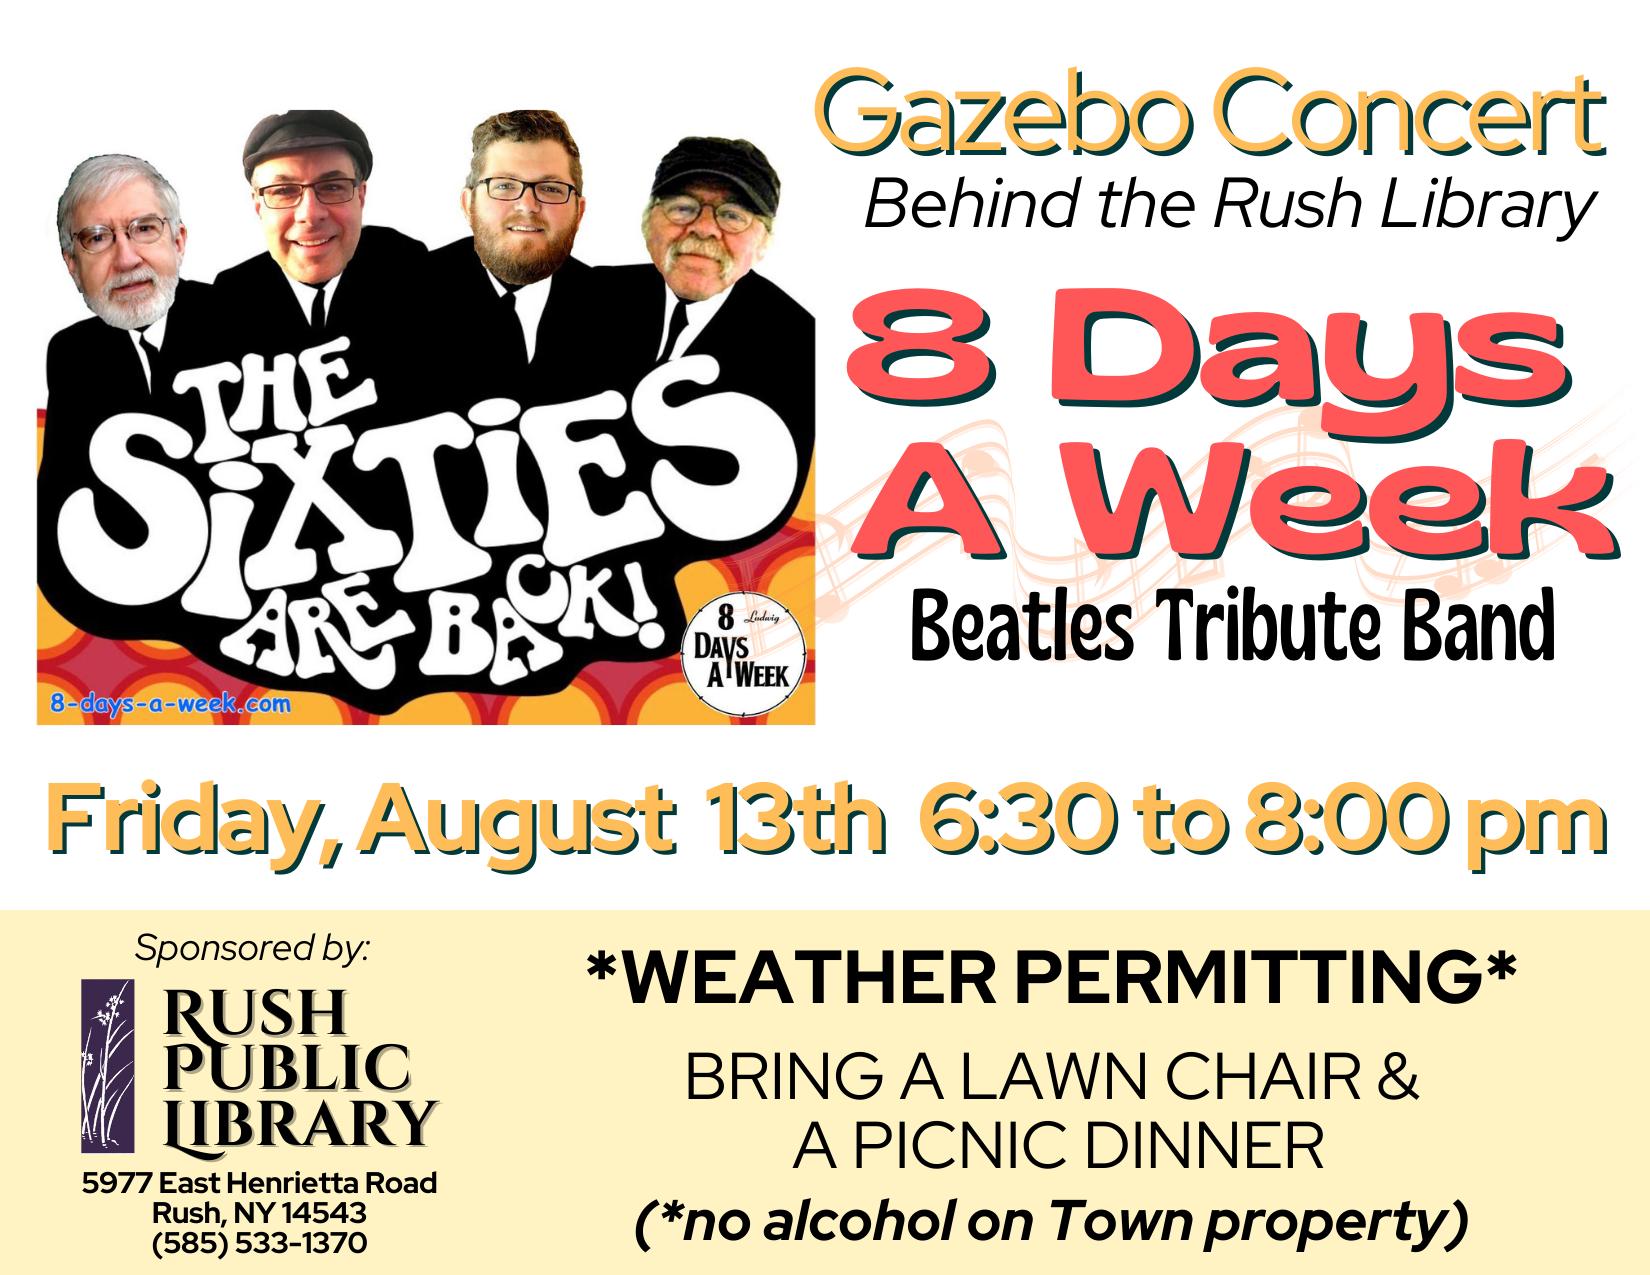 Gazebo Concert: 8 Days A Week